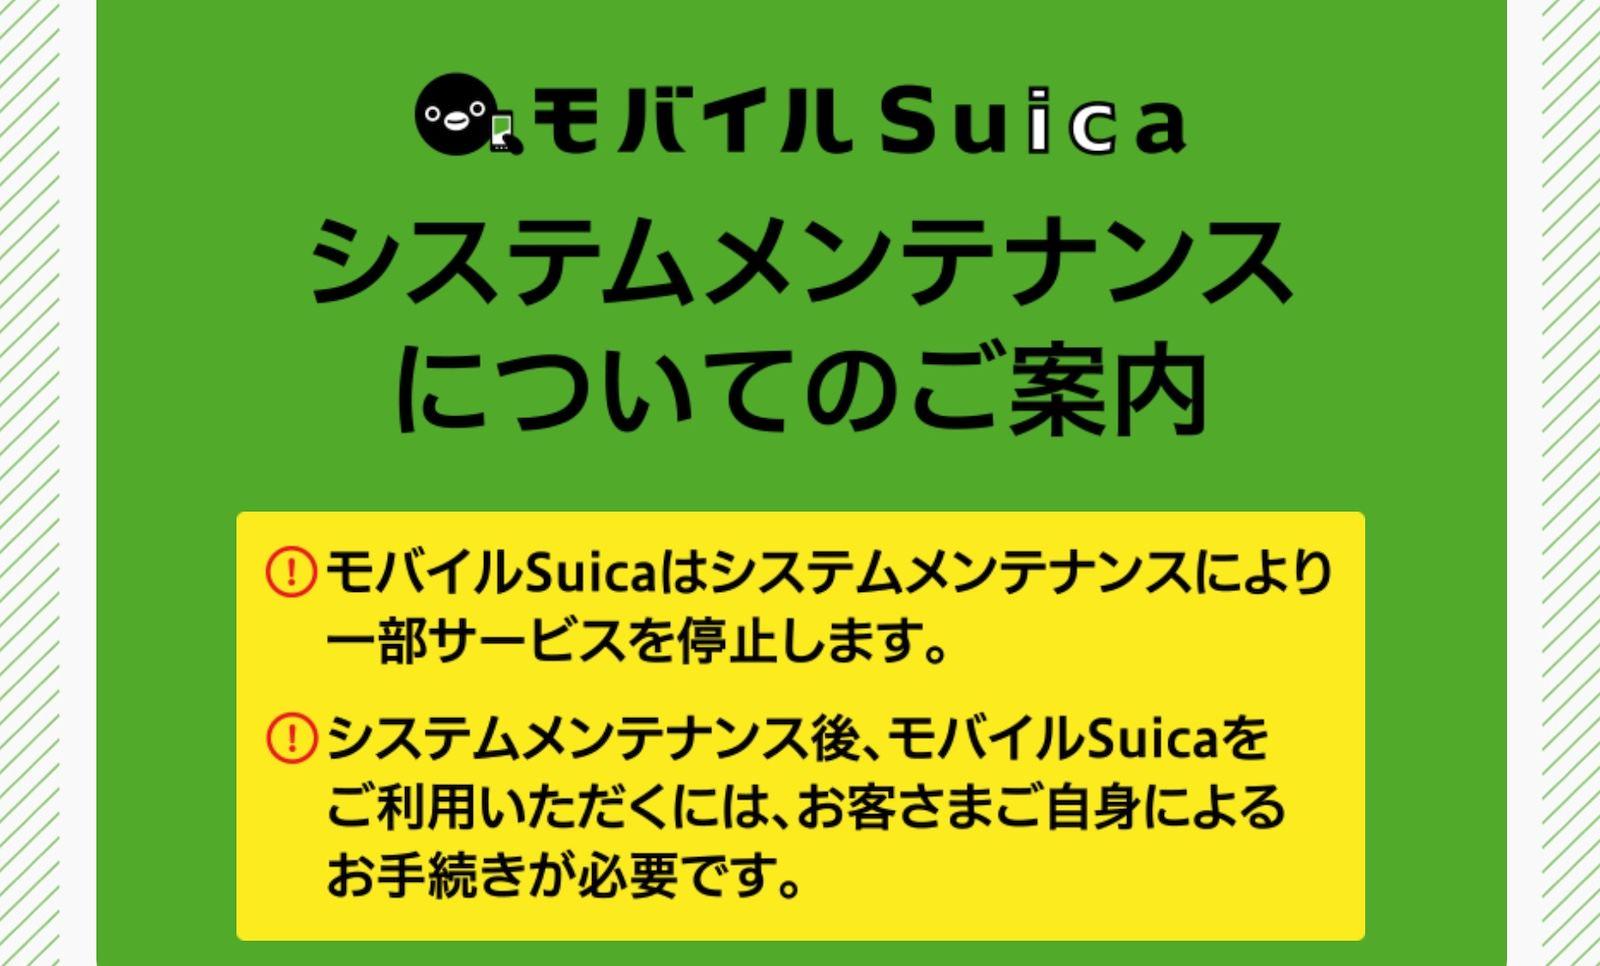 Suica mobile caution